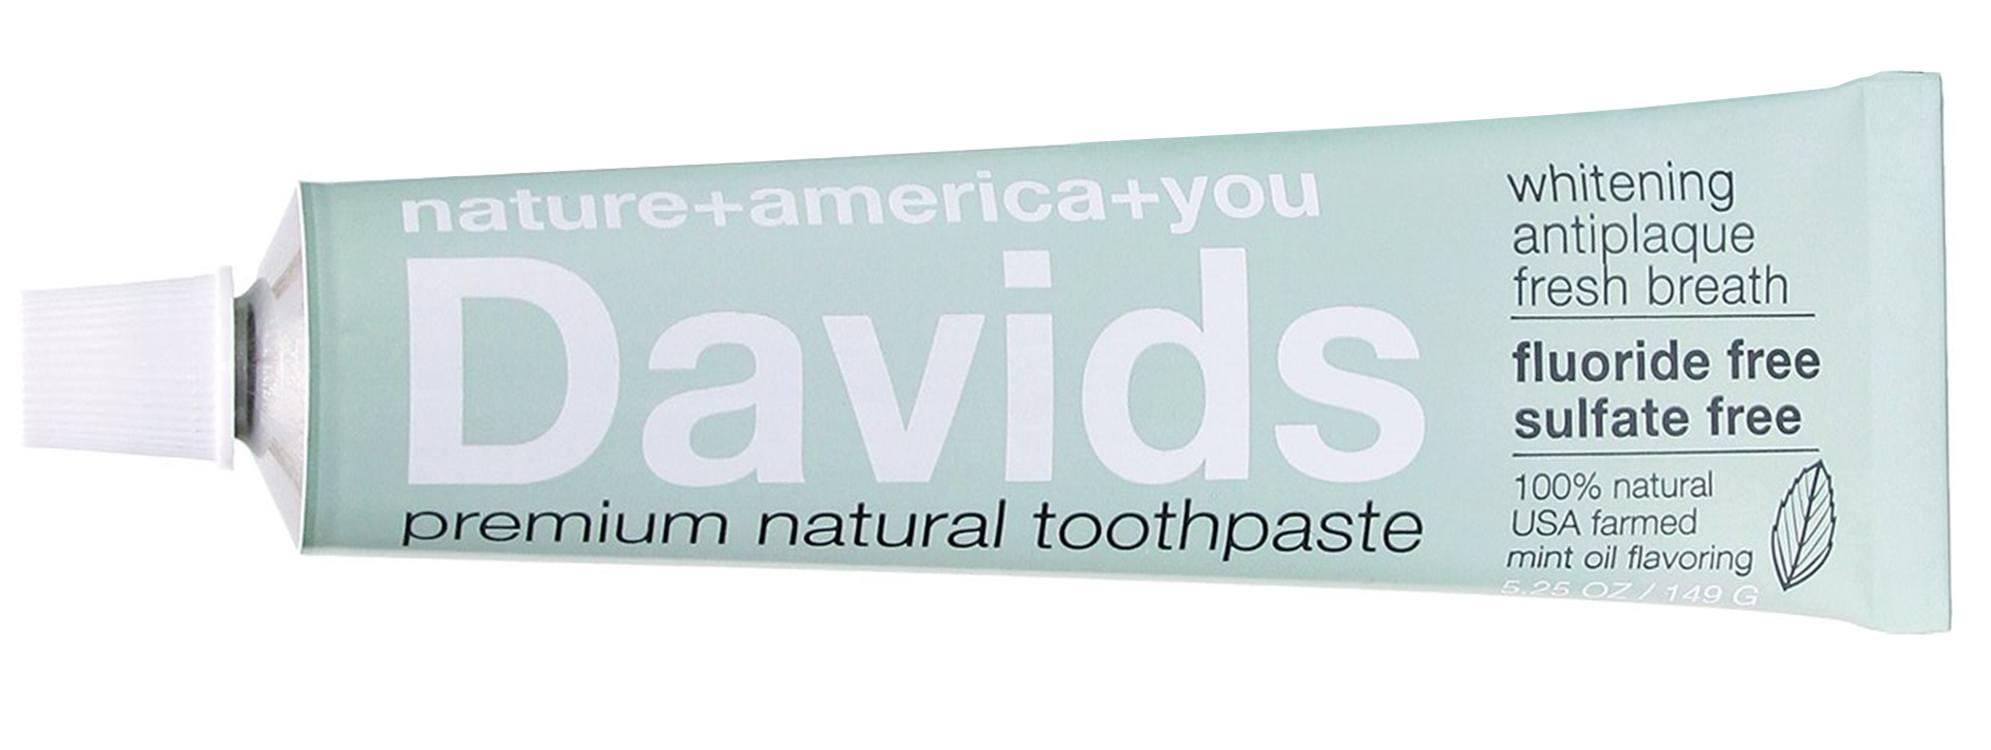 Davids Natural Toothpaste - FLAT